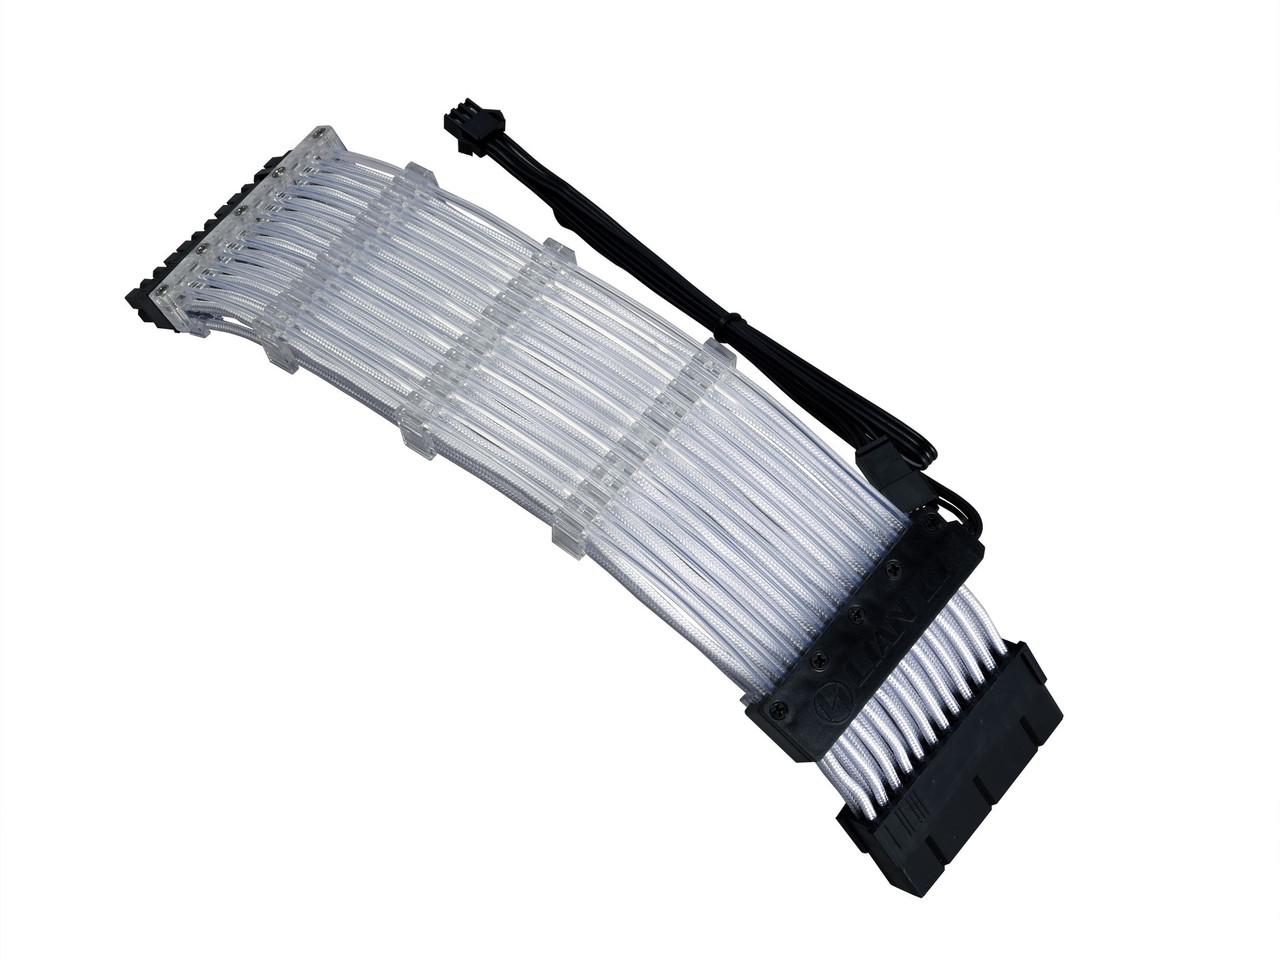 wccftech-lian-li-rgb-cables-3